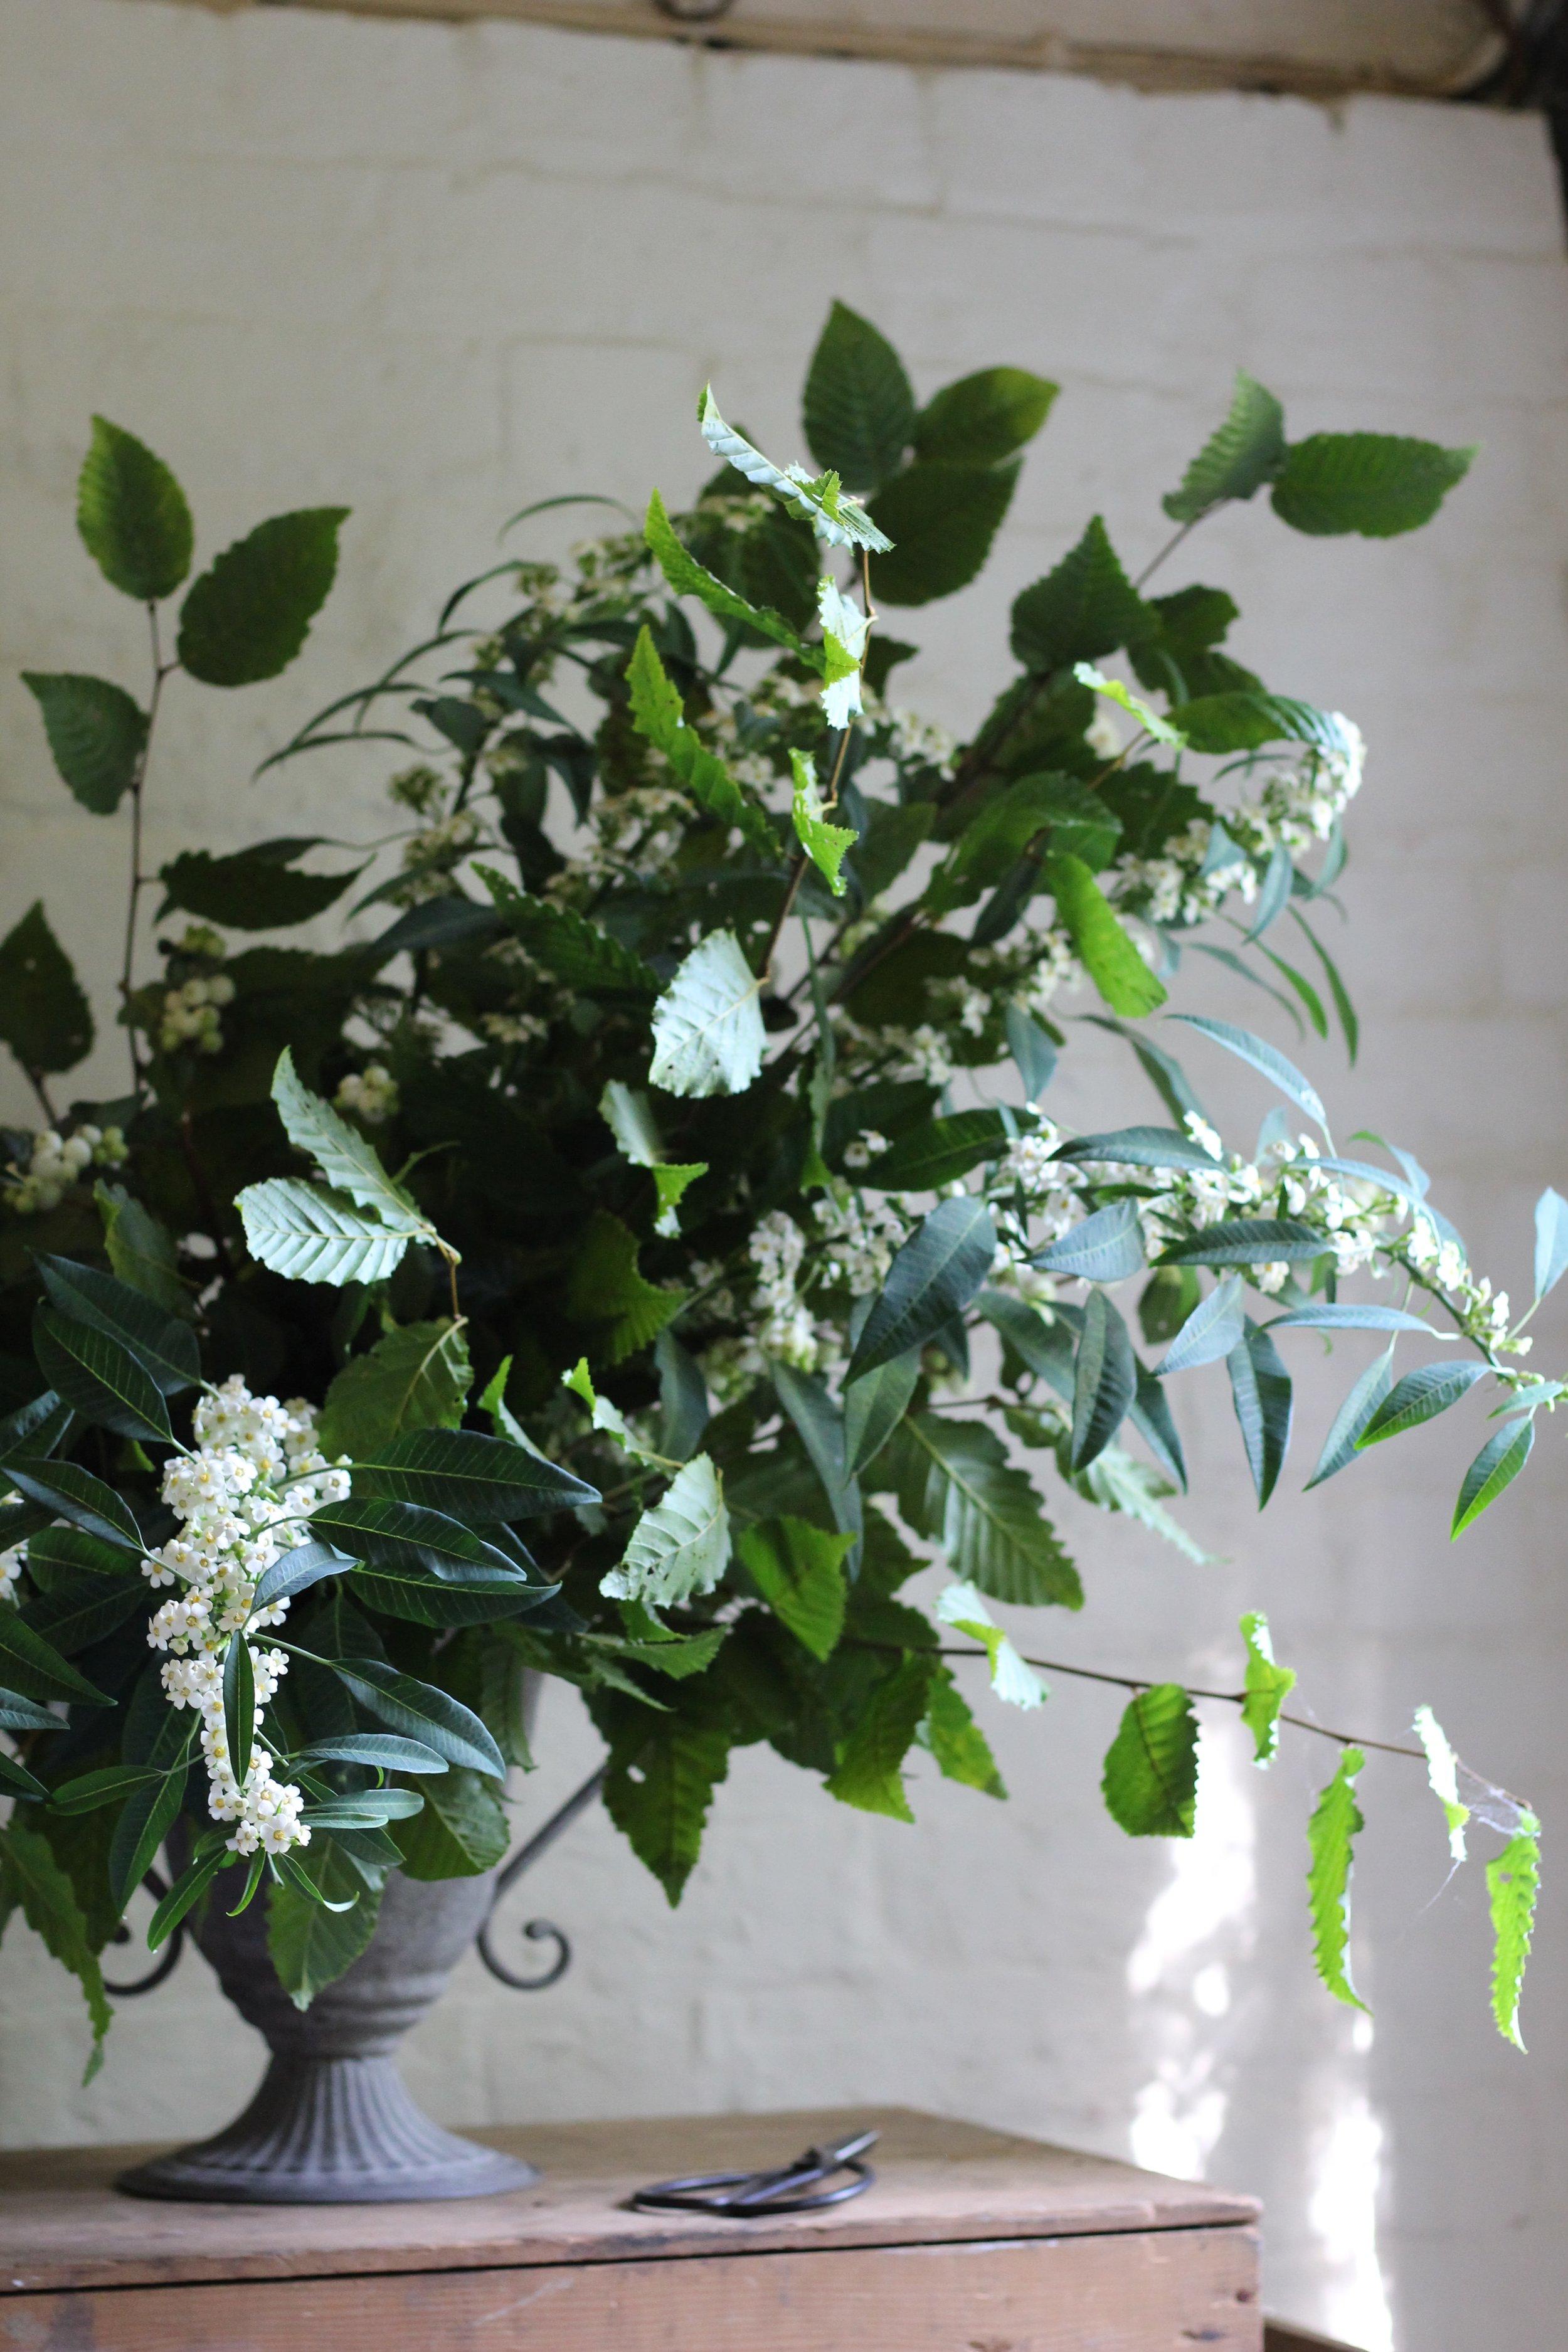 Jennifer Pinder Kent London florist flowers does a botanical themed green and white wedding at Jamies italain restaurant in London threadneedle street